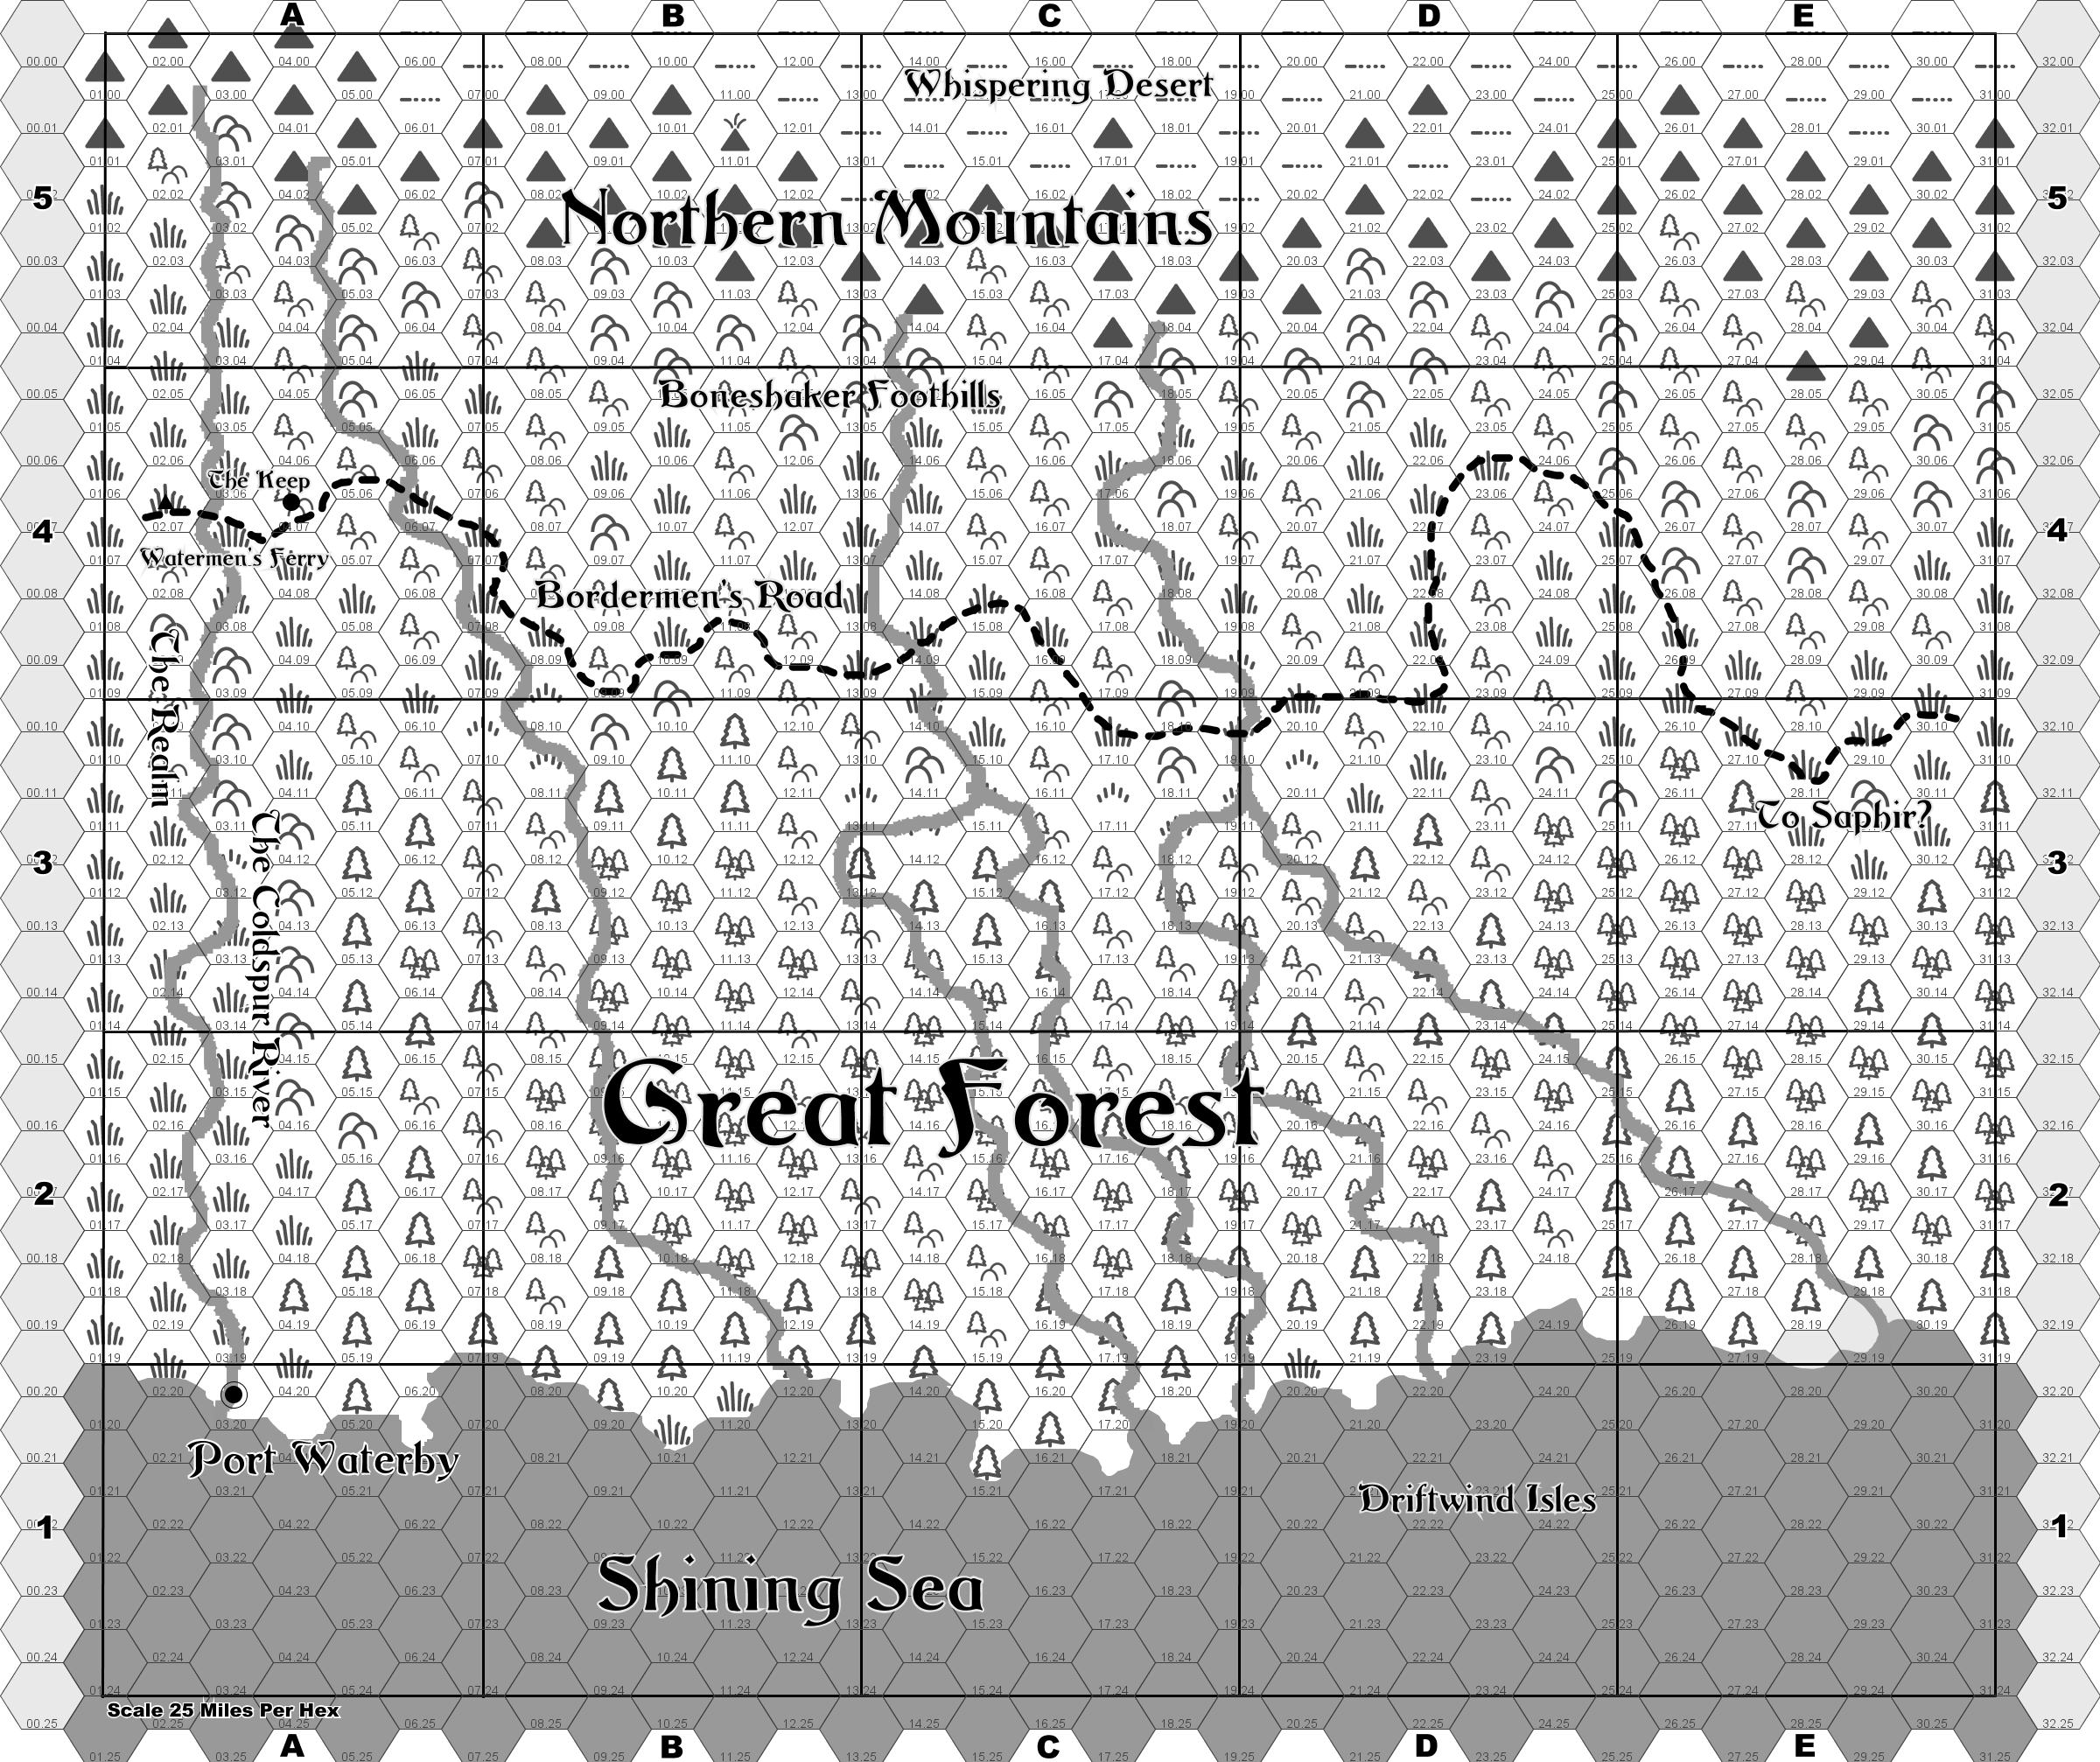 Borderlands_25x25_25_mi_per_hex_monochrome_Atlas_Grid_Full – Breeyark!